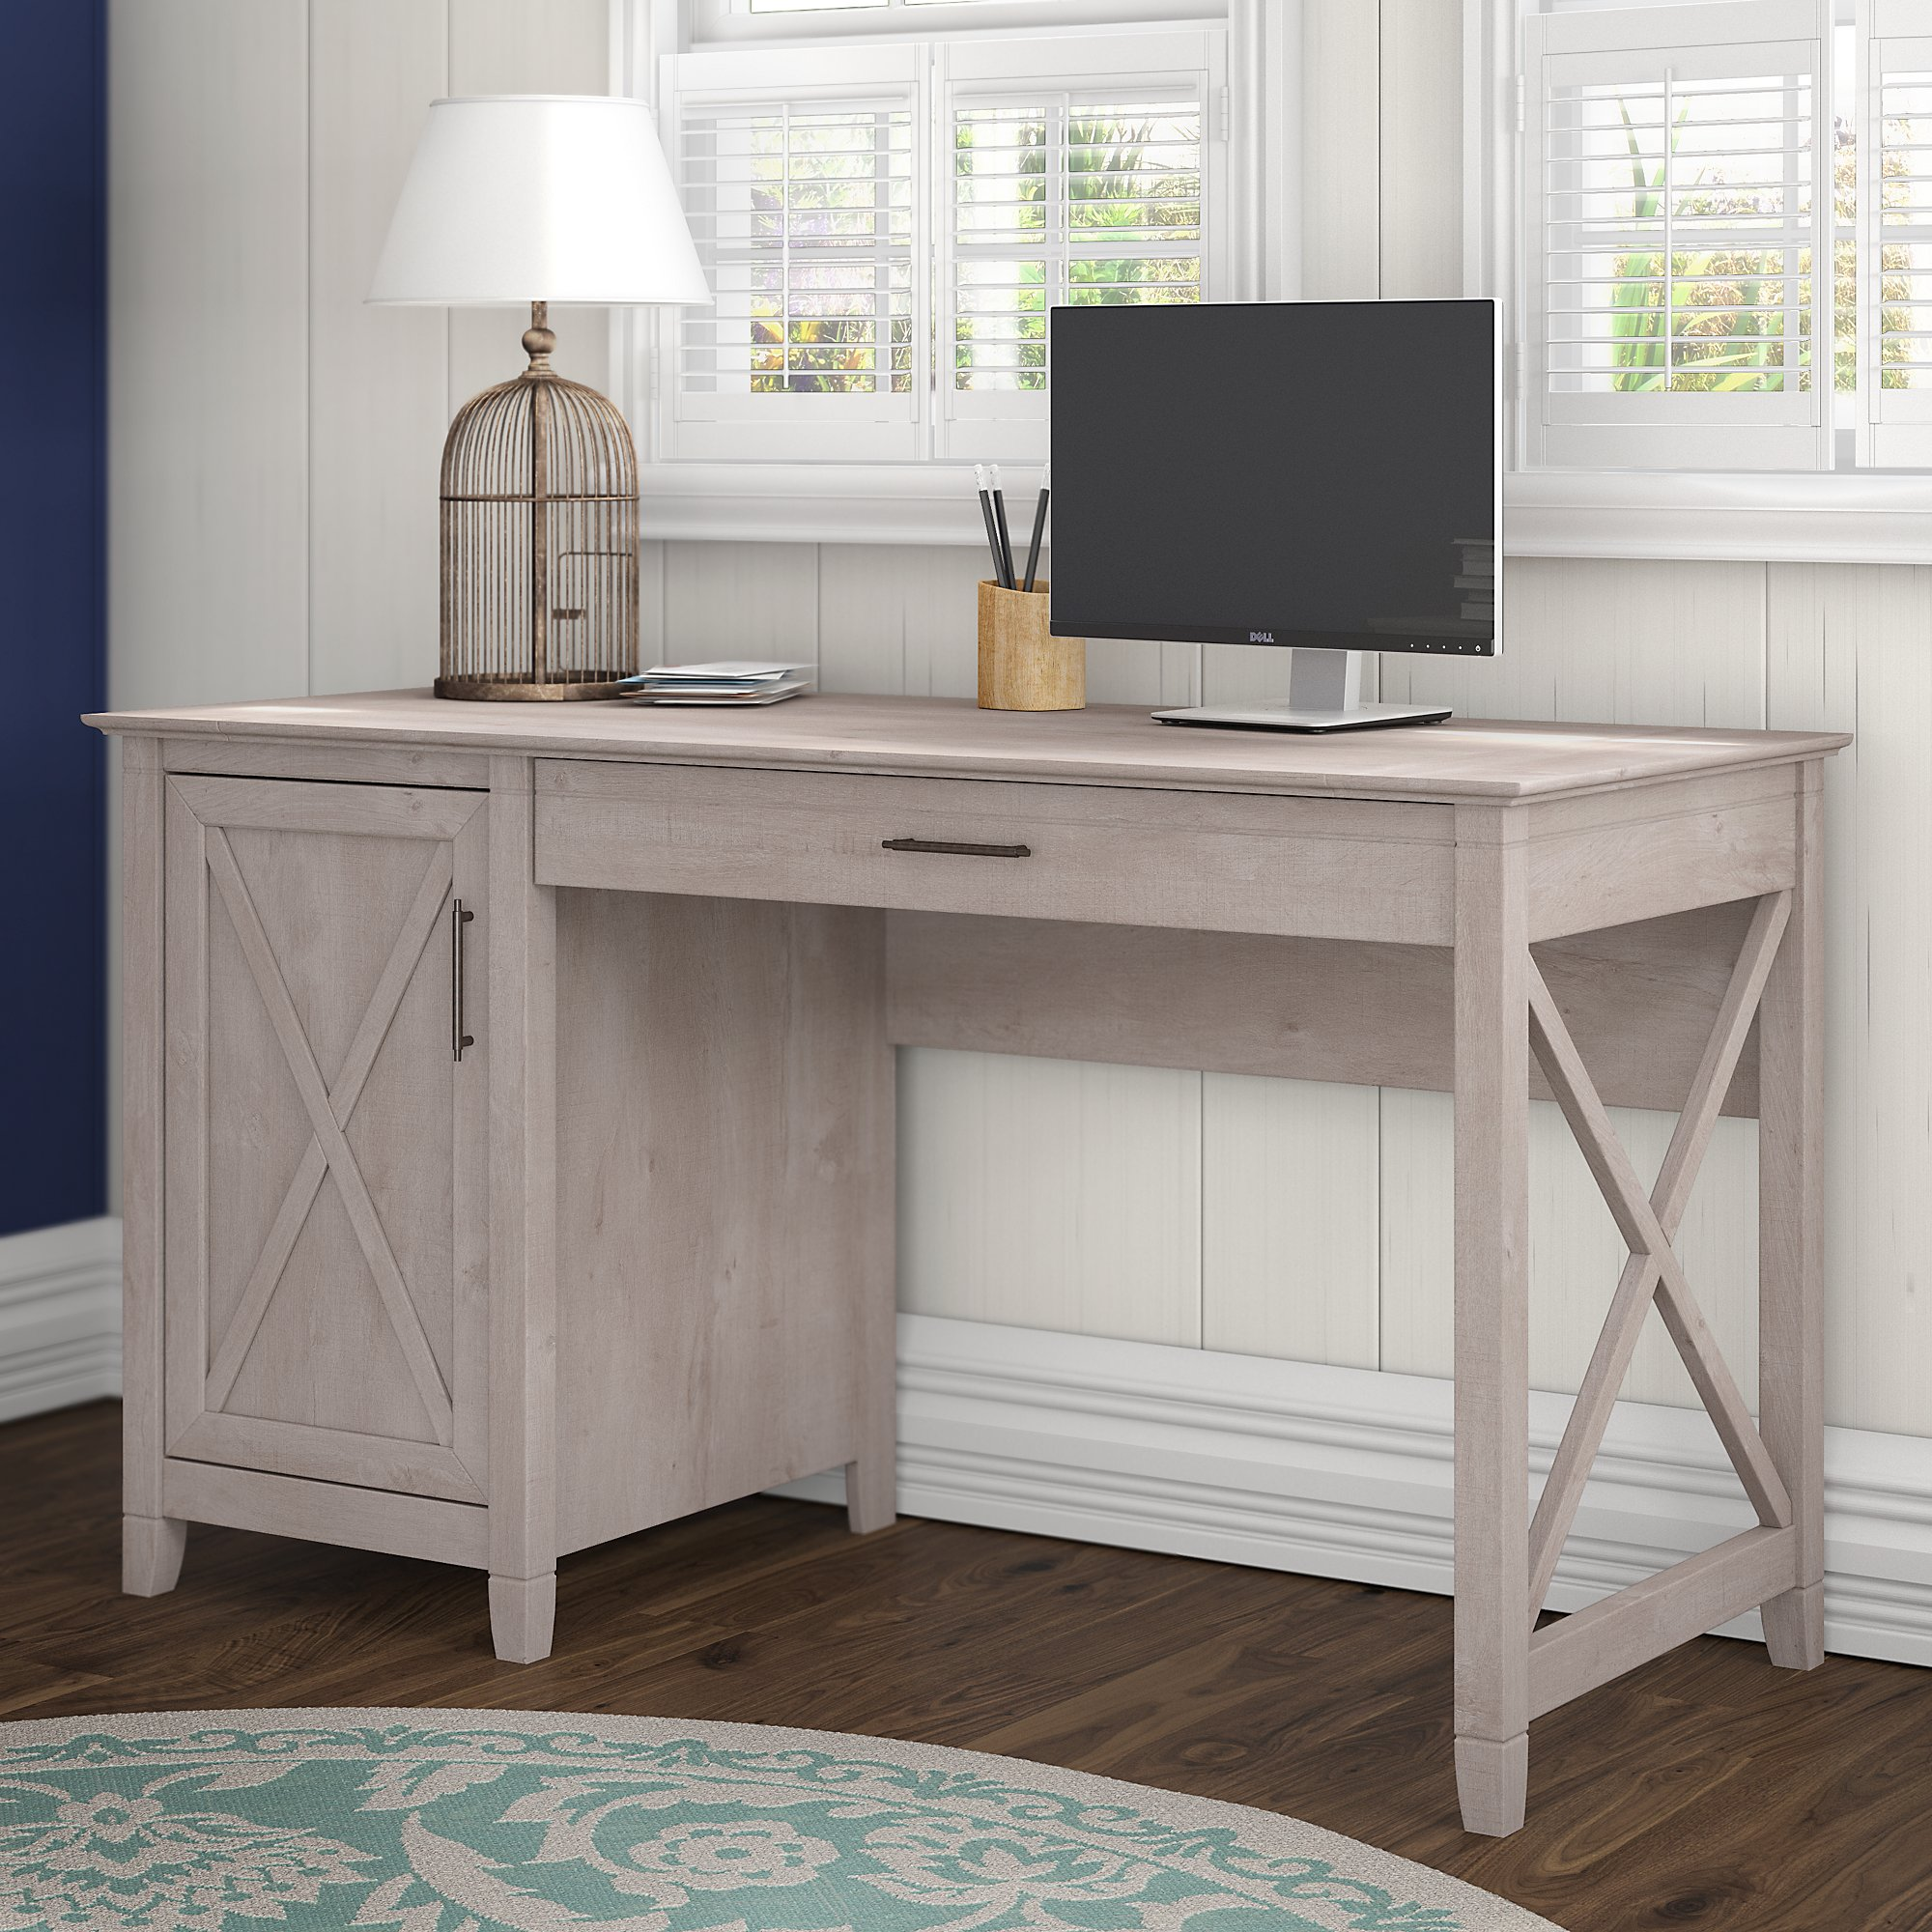 bush furniture key west 54w puter desk with storage in